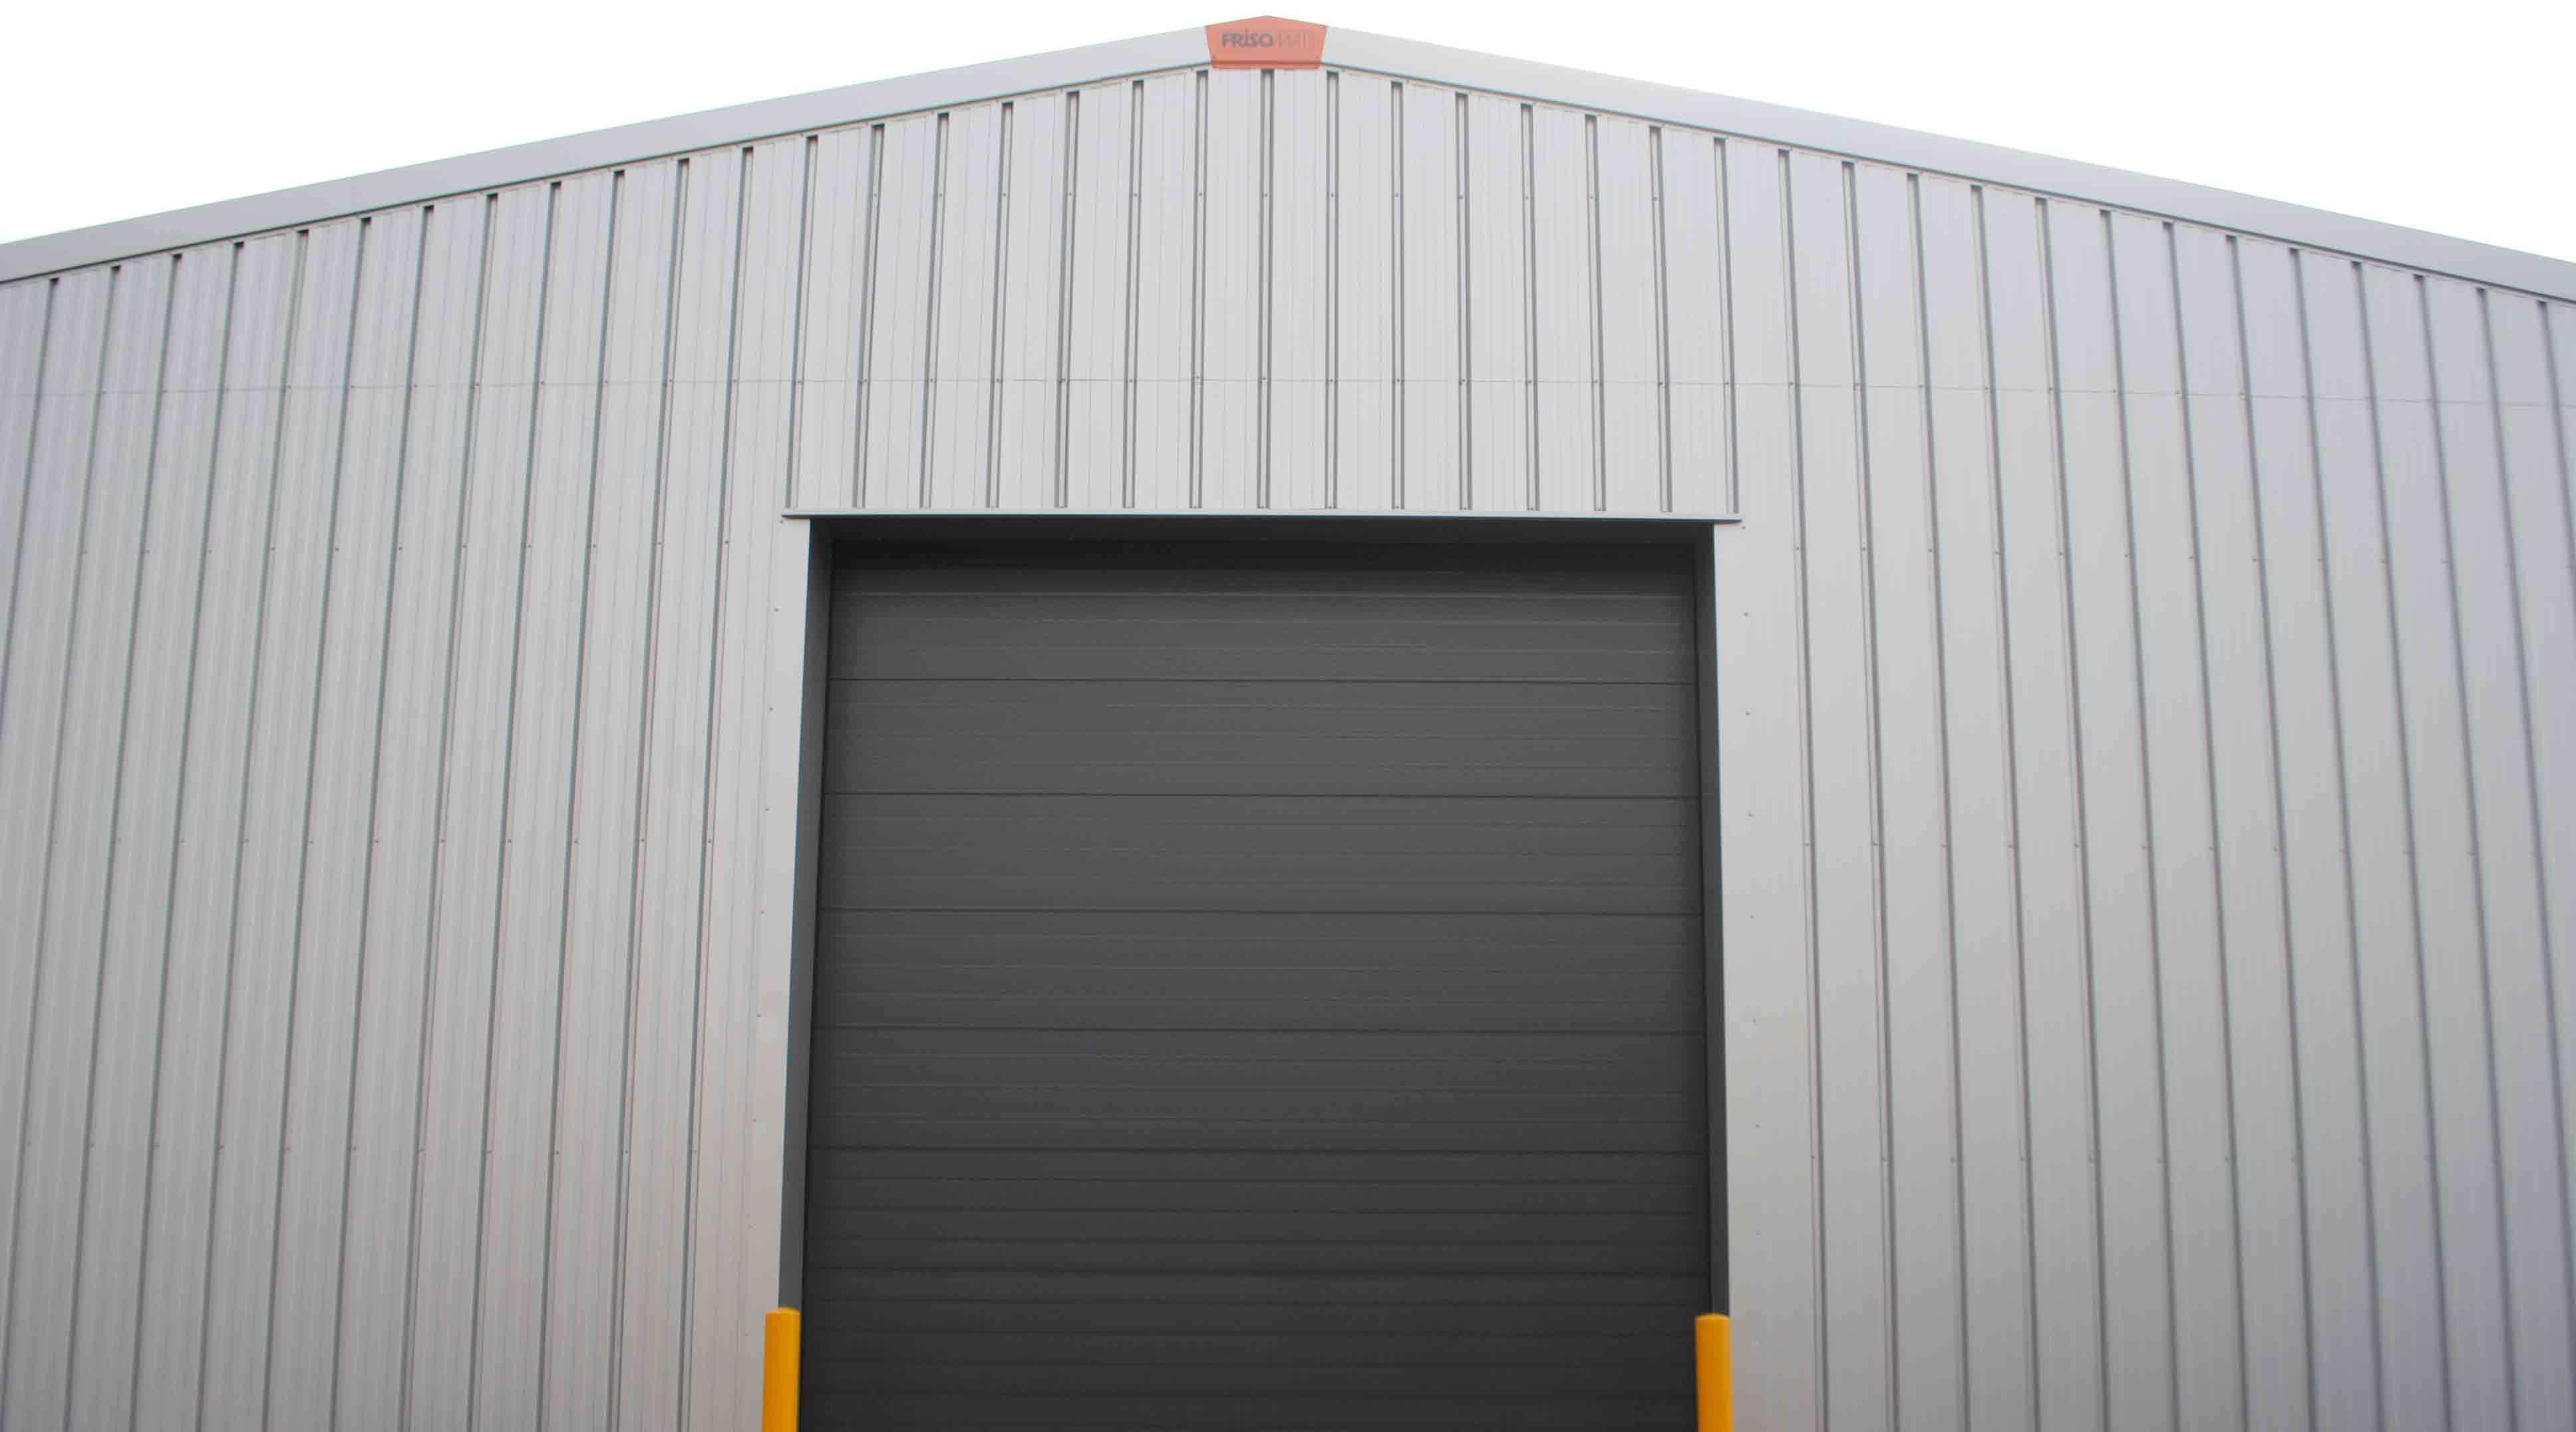 Go-Serie Industriegebäude - We Shelter Your Business   Frisomat